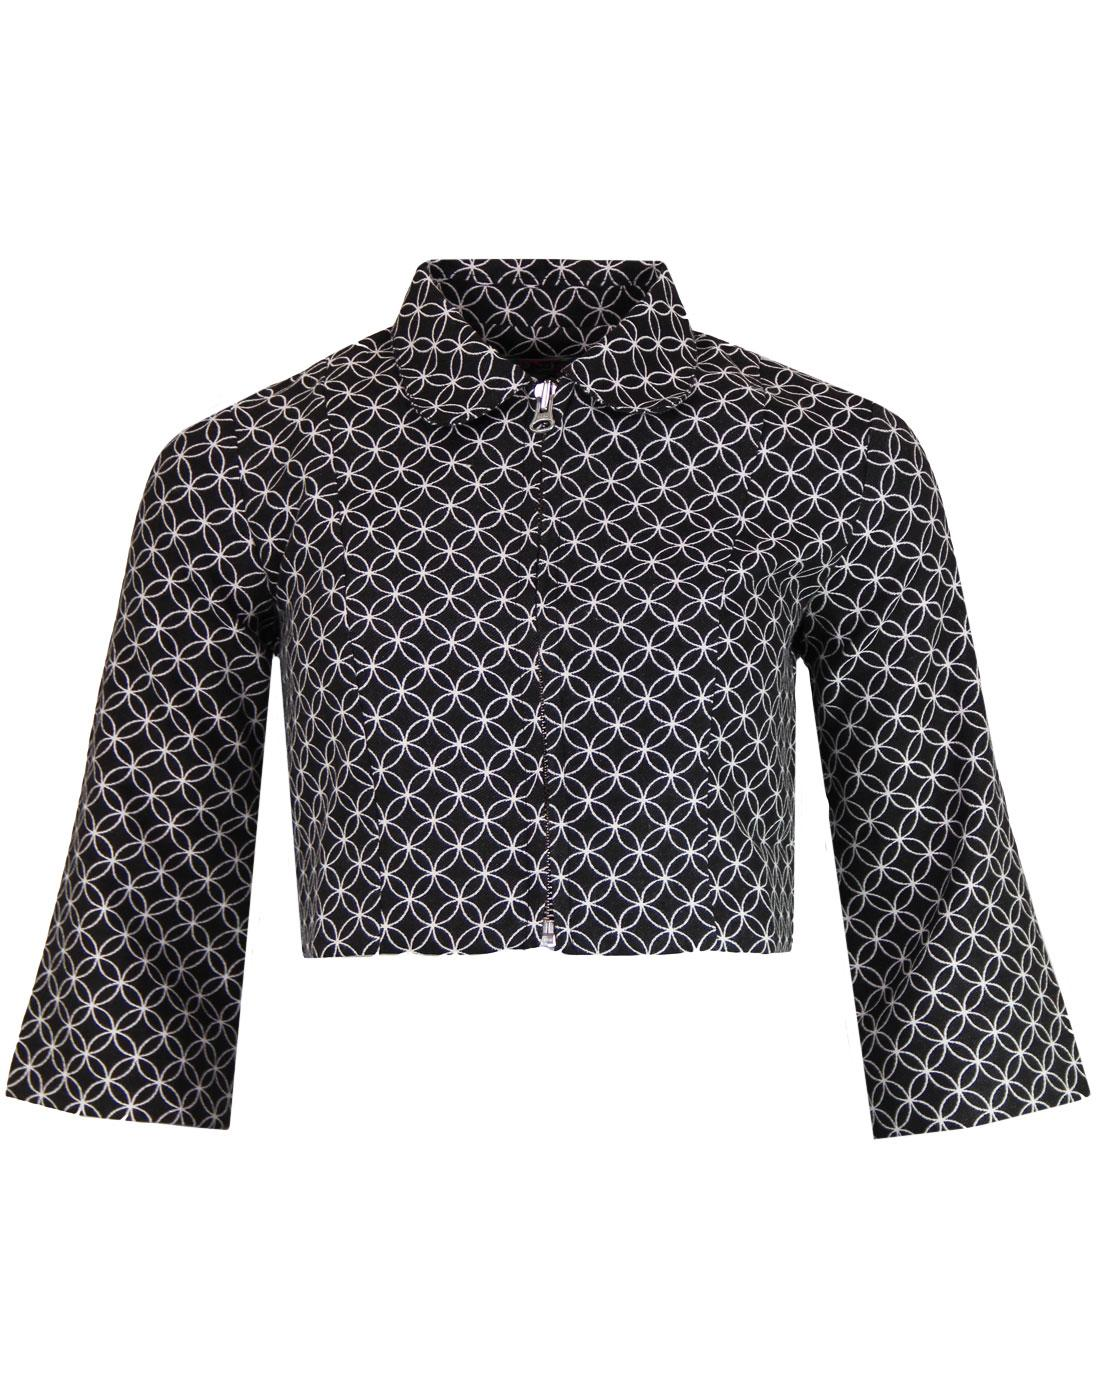 bijoux madcap england 1960s mod geo circle jacket